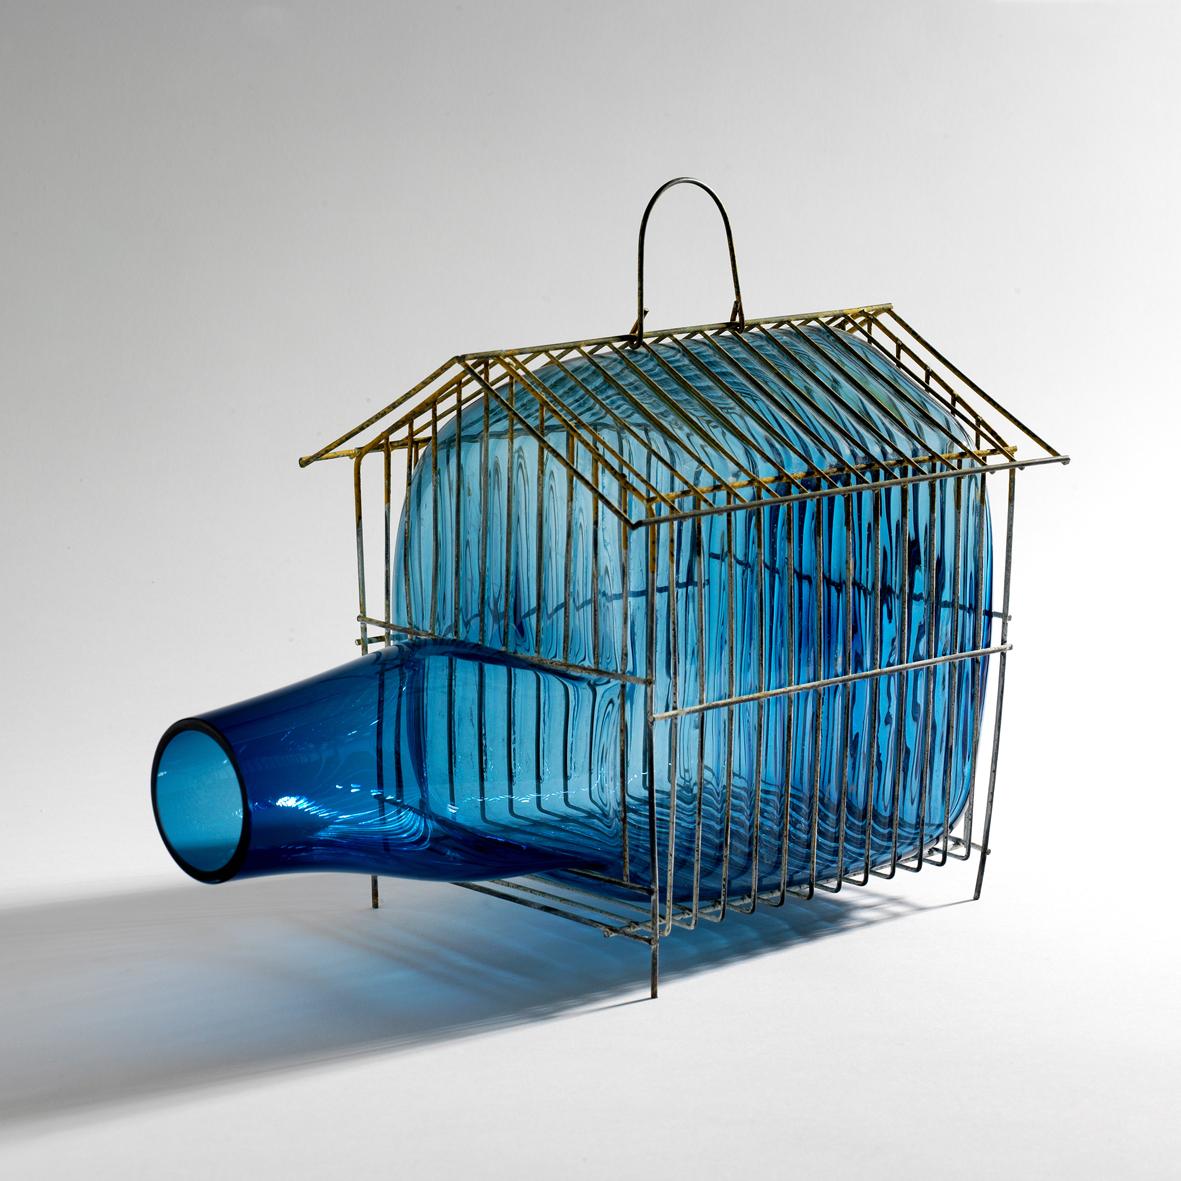 web222-gala_fernandez_blue_glass-cage_house-marion-friedmann-gallery.jpg